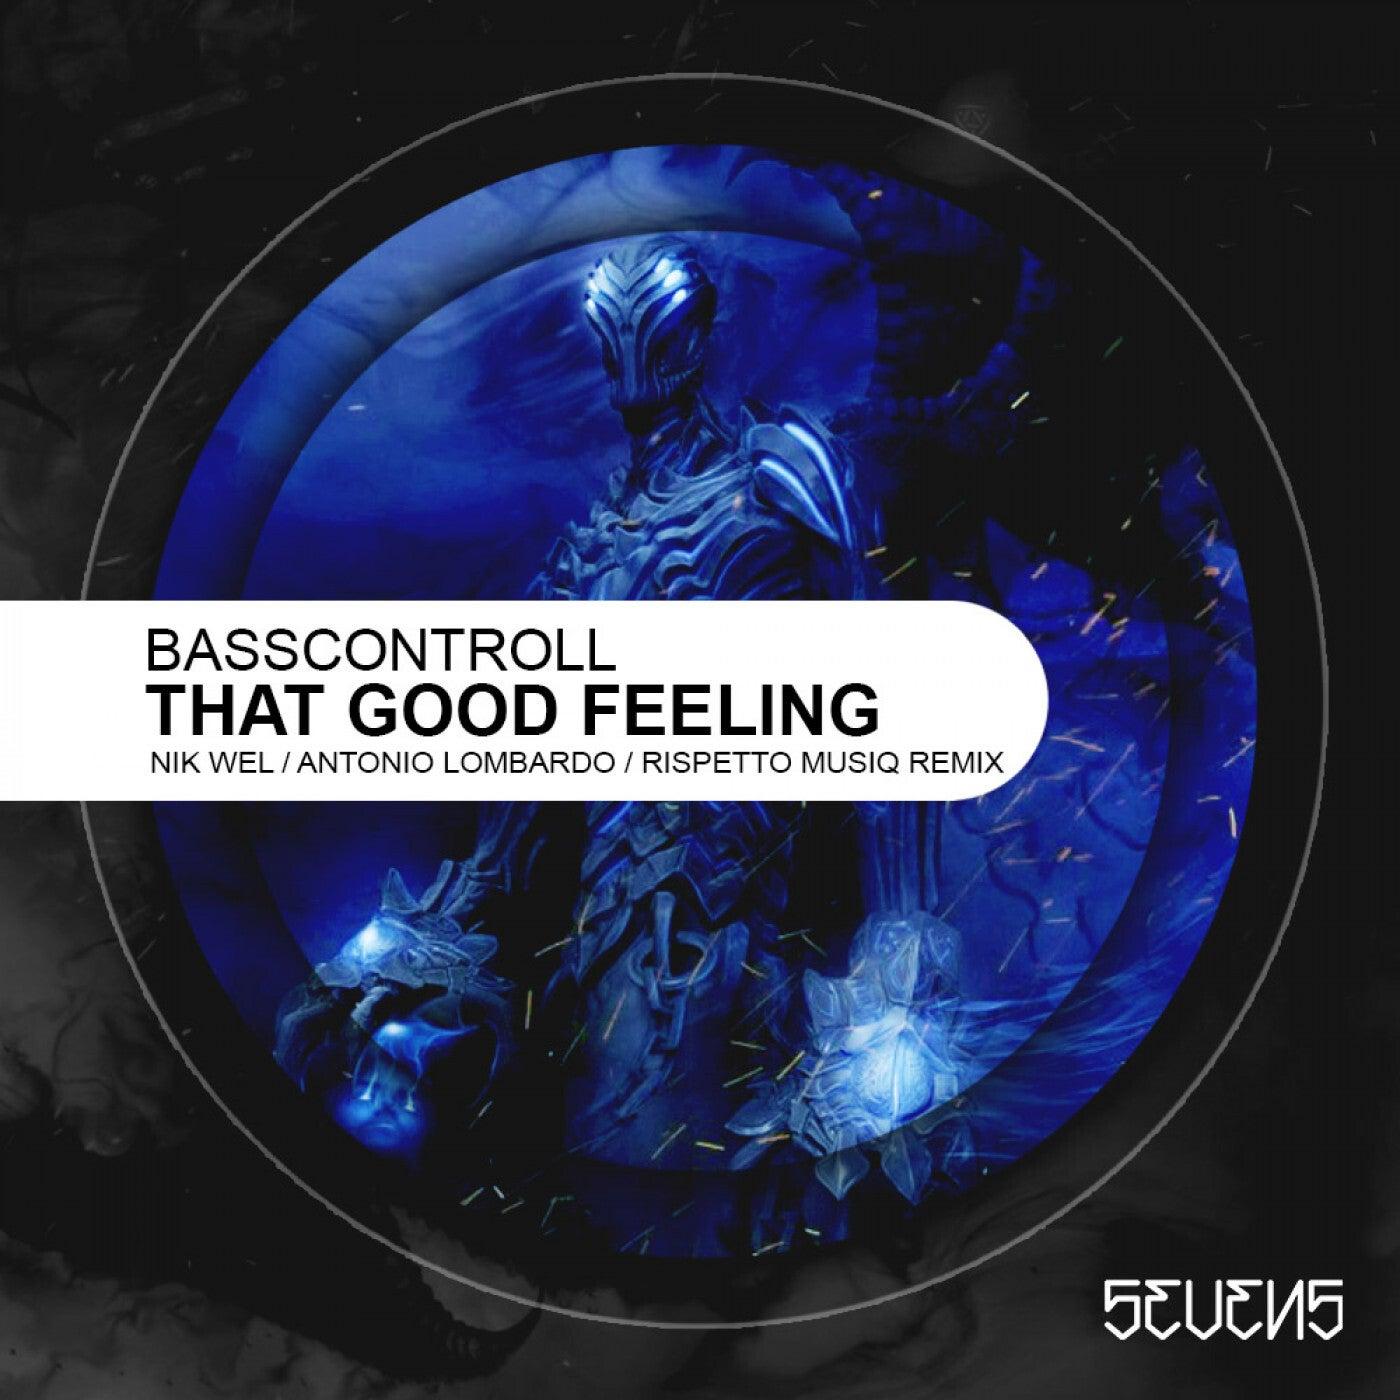 That Good Feeling (Nik Wel Remix)